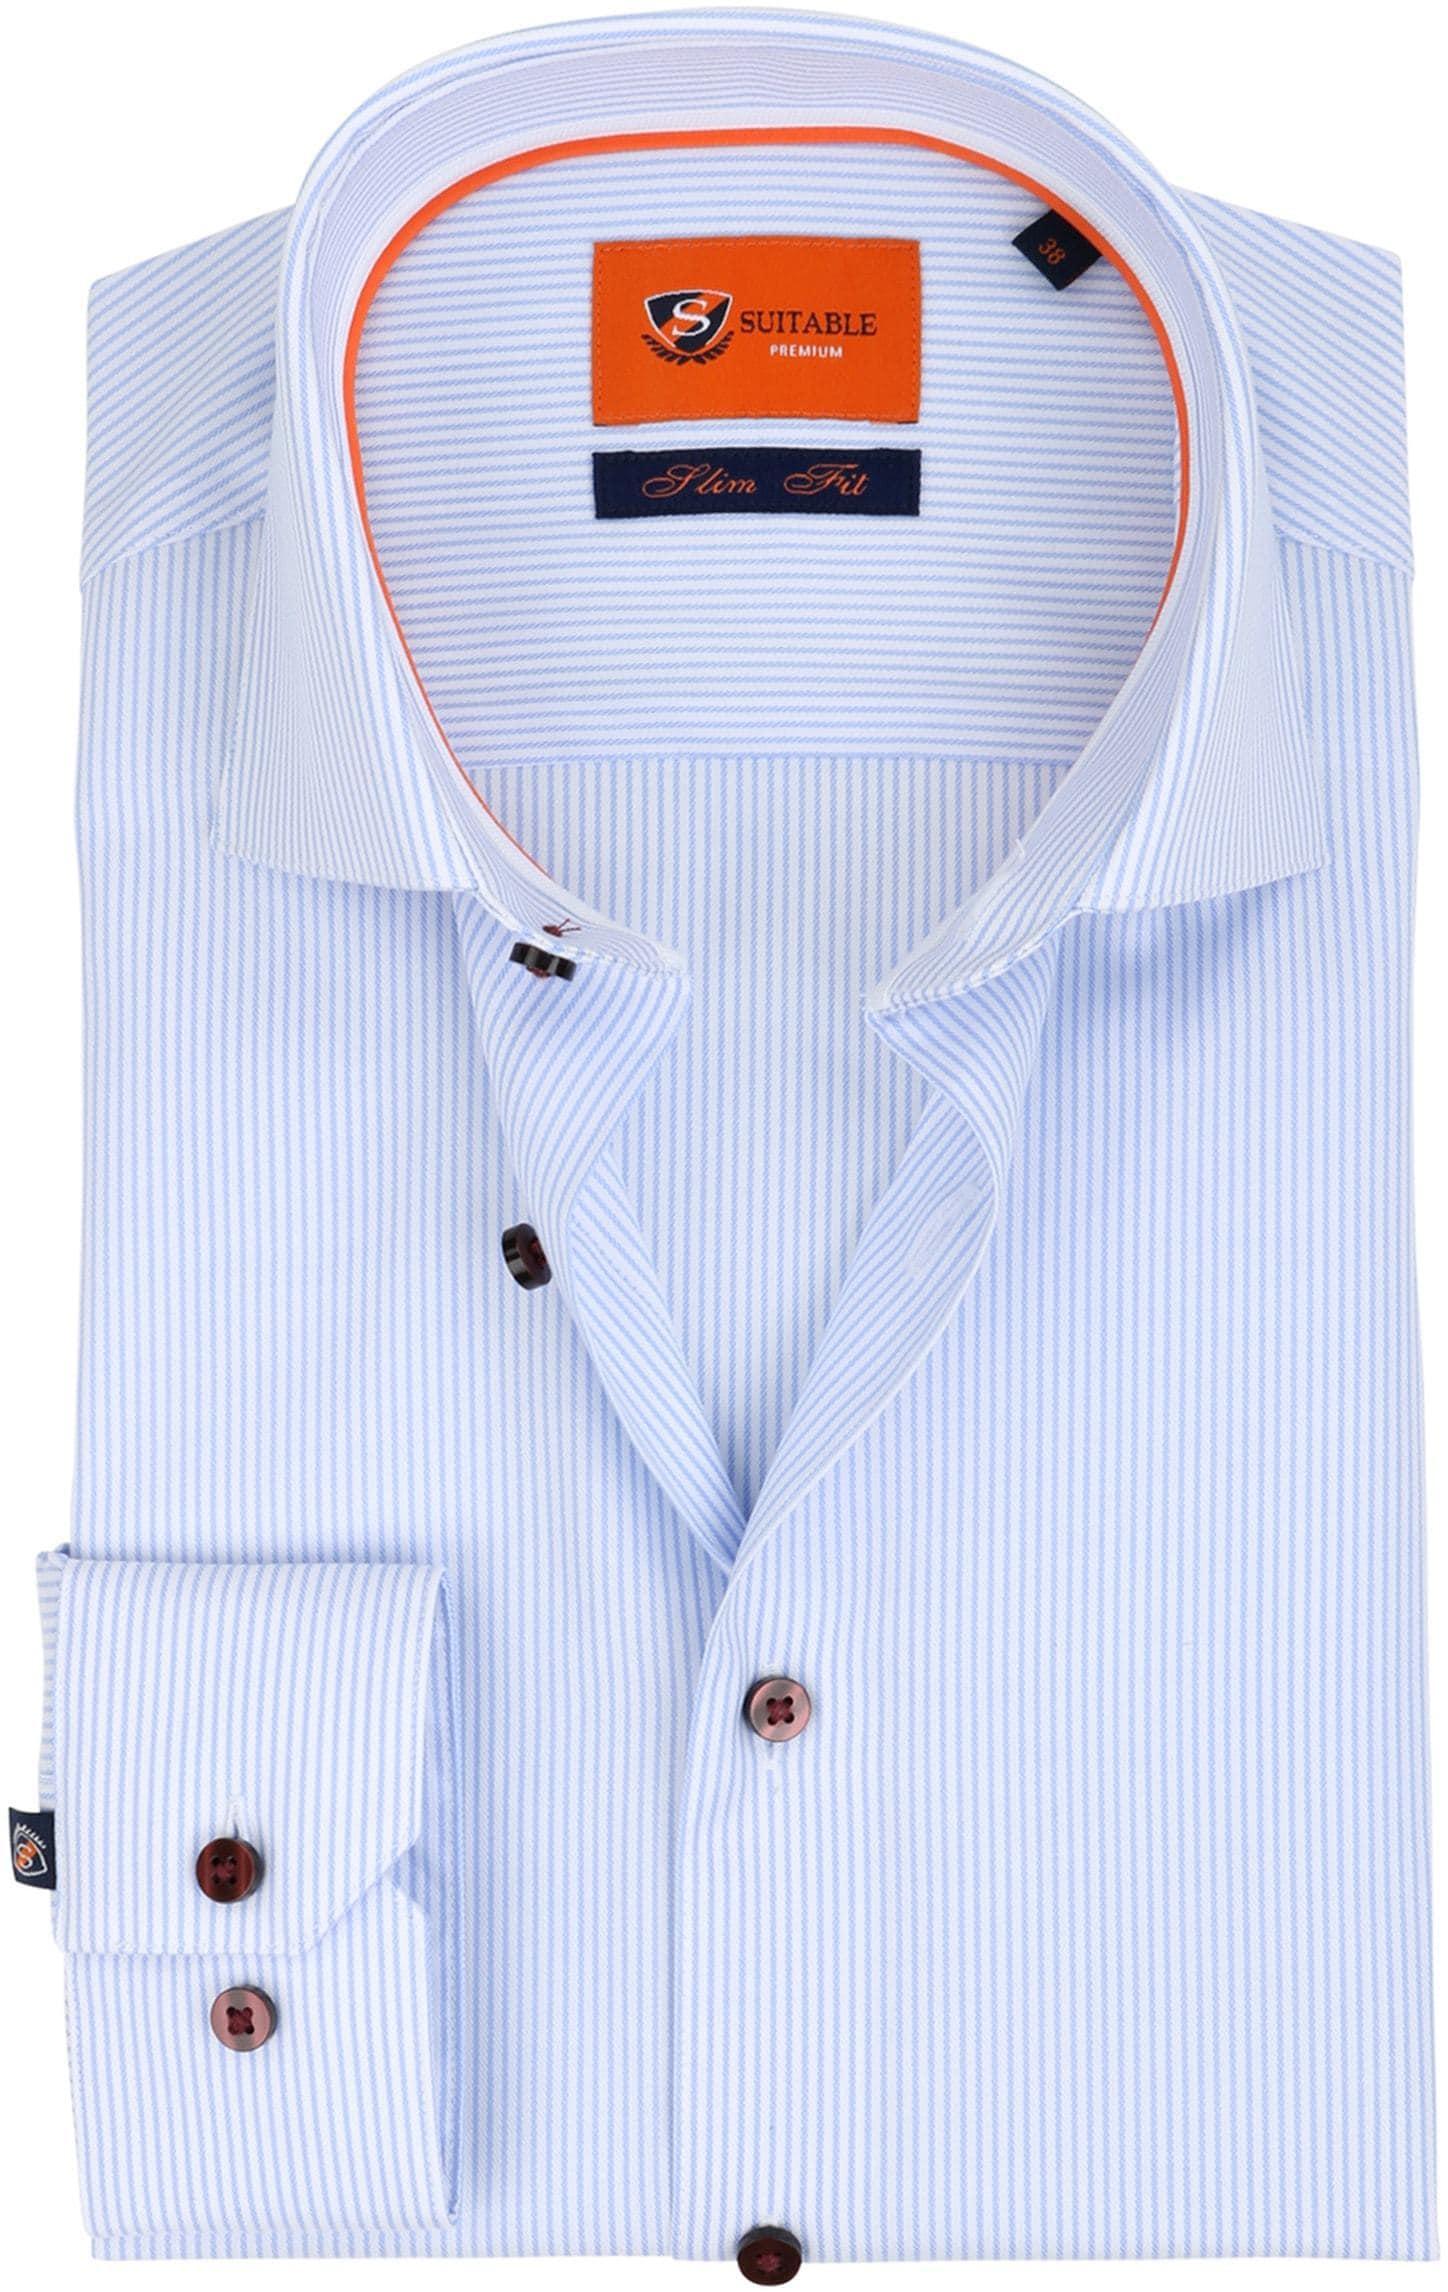 Suitable Overhemd Cotelet Blauw foto 0